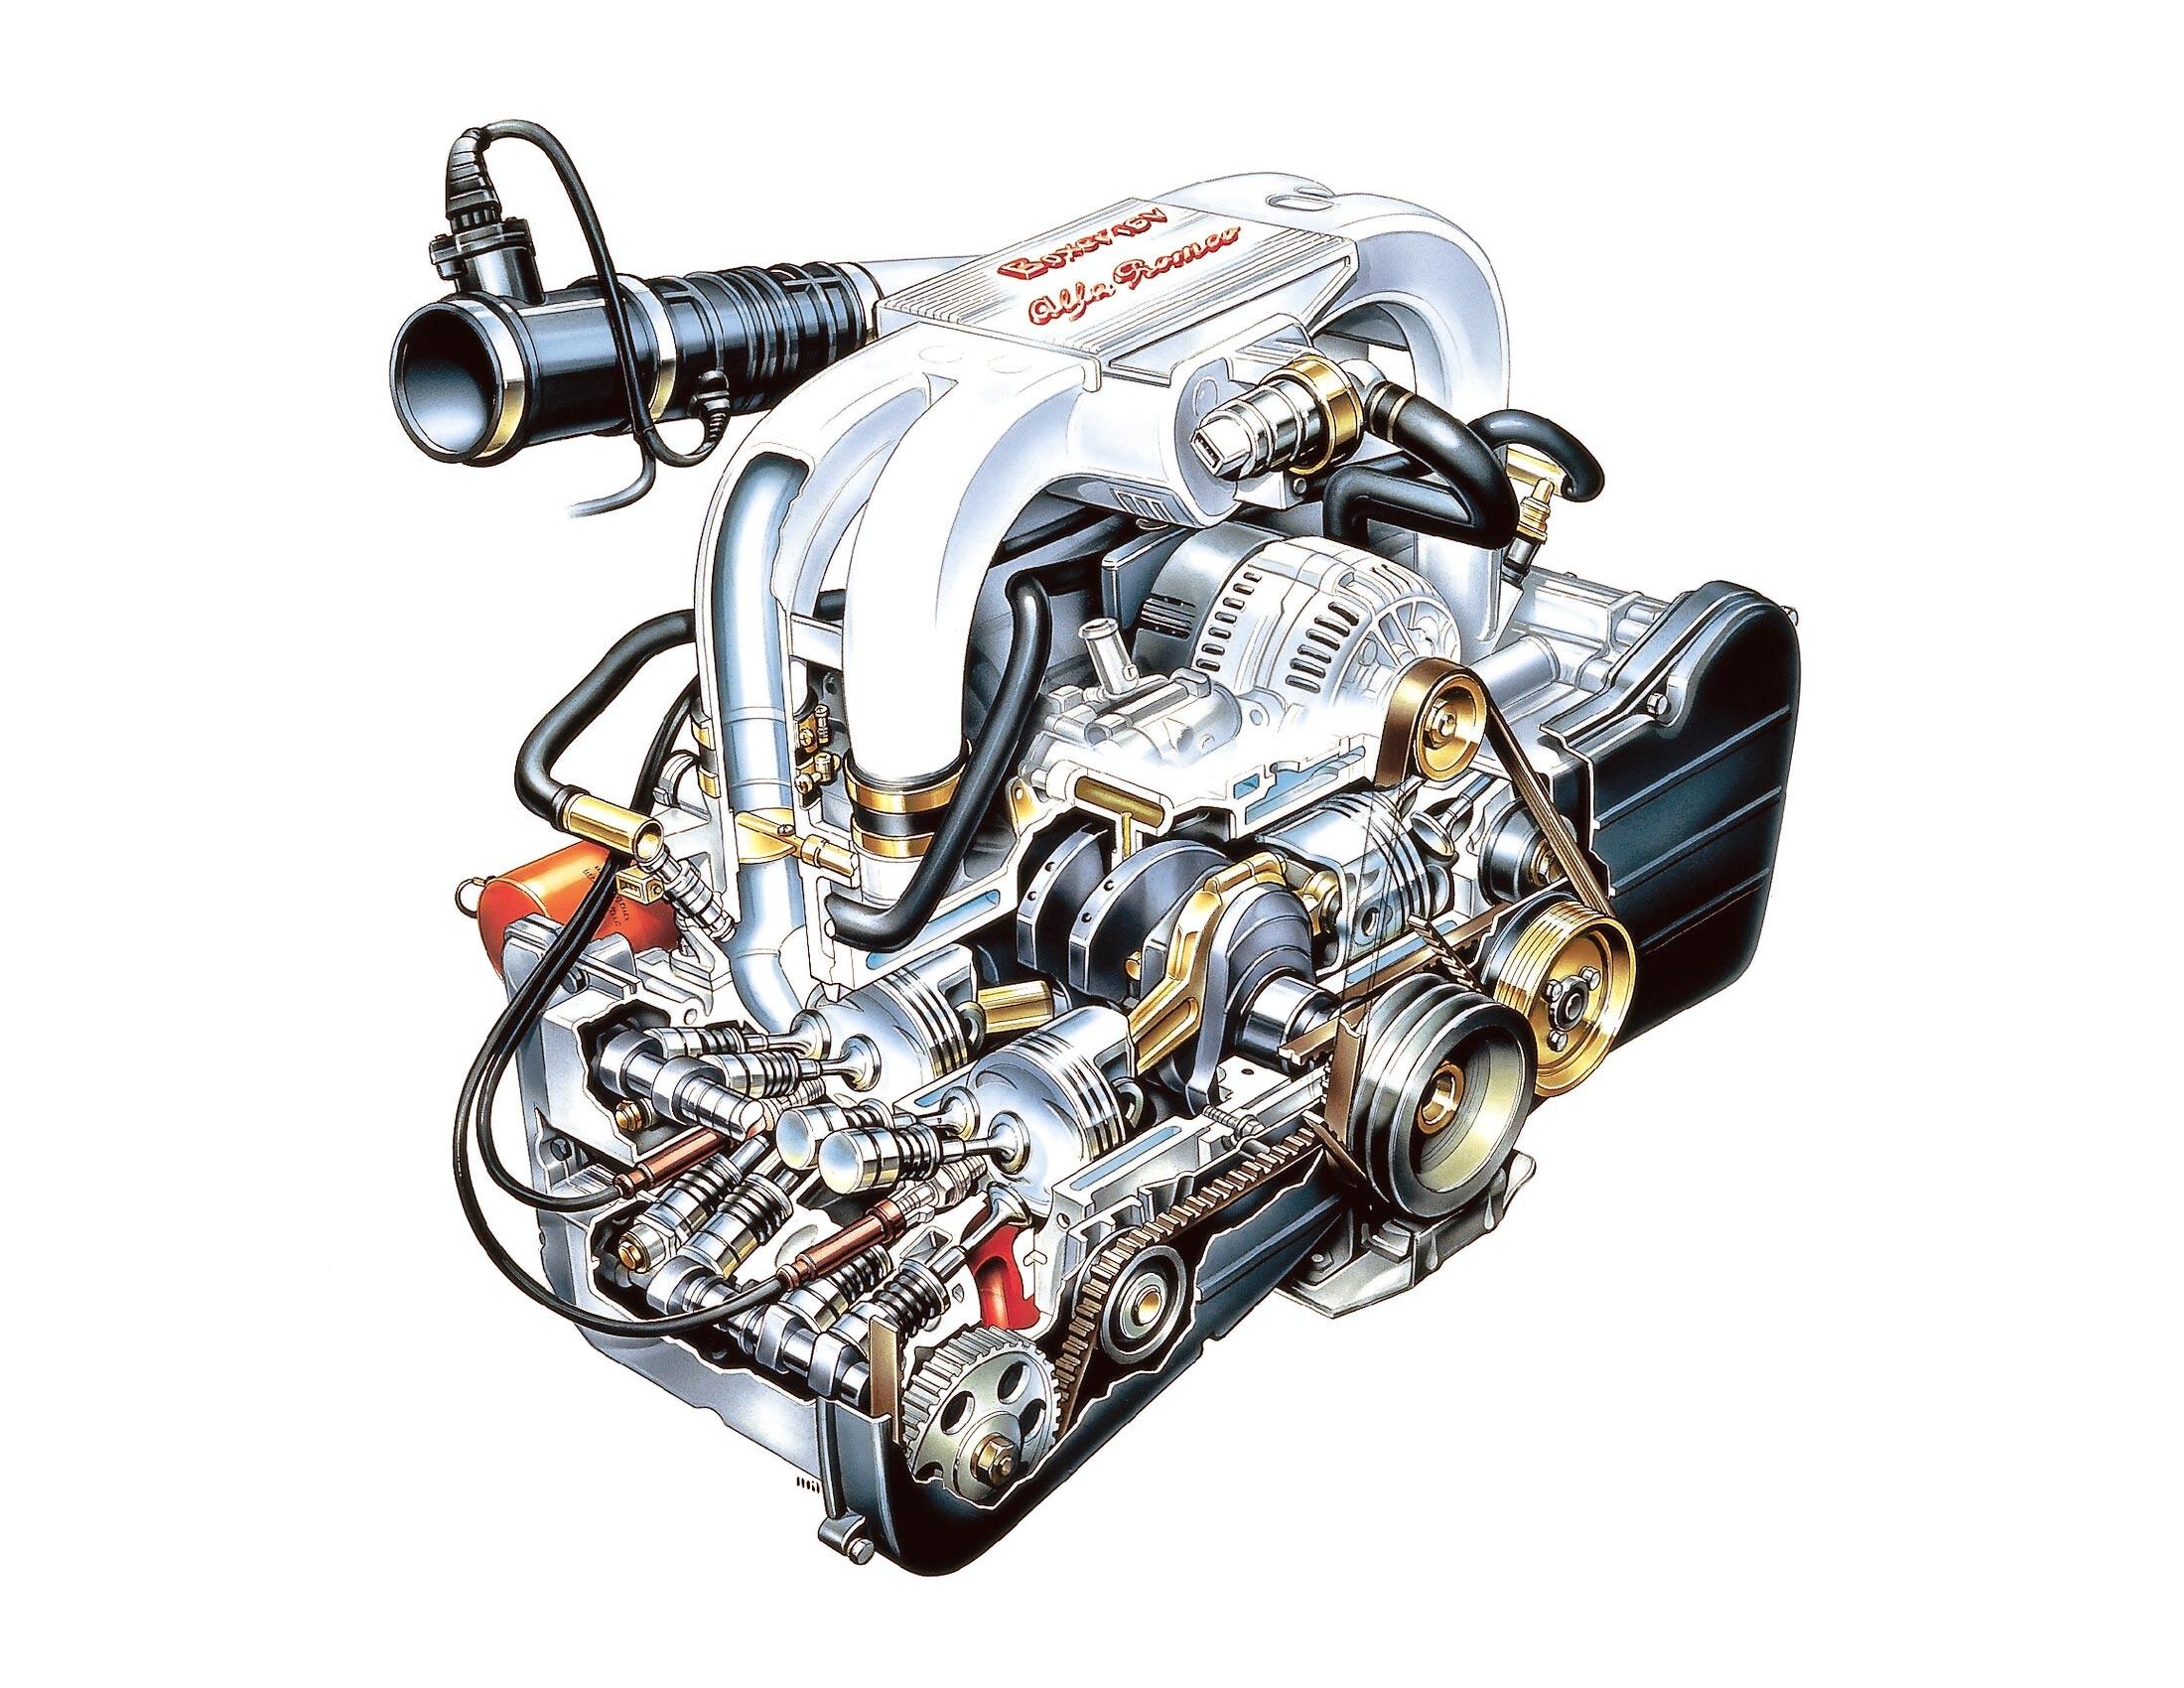 Alfa Romeo AR 33401 engine cutaway drawing